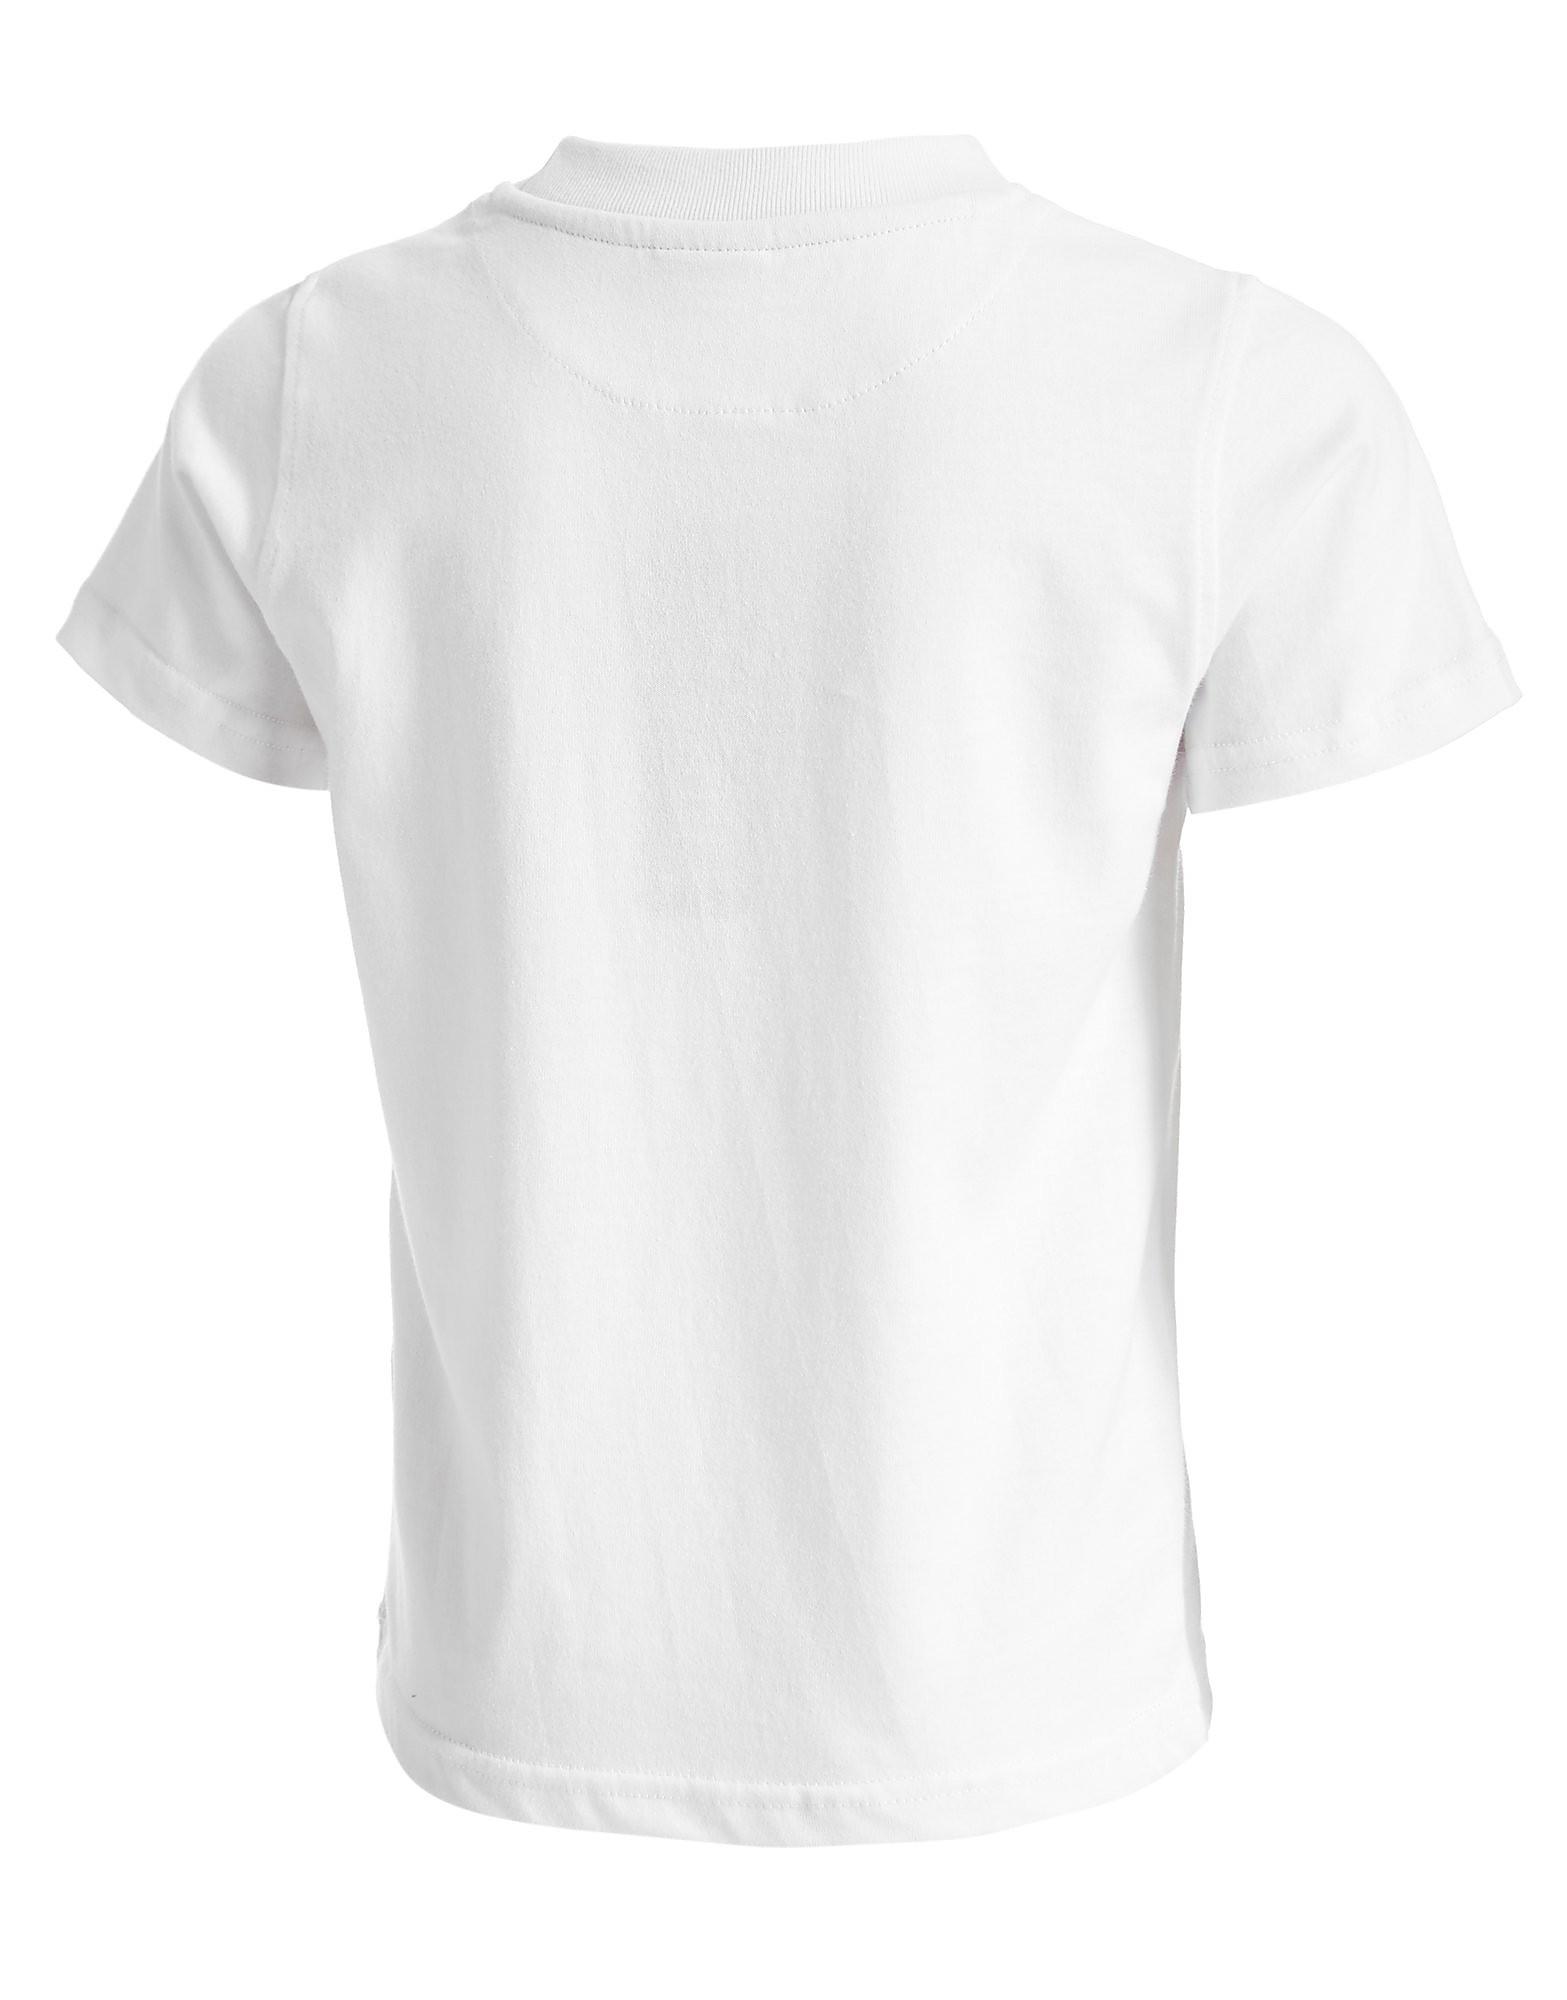 Carbrini Priory T-Shirt Children